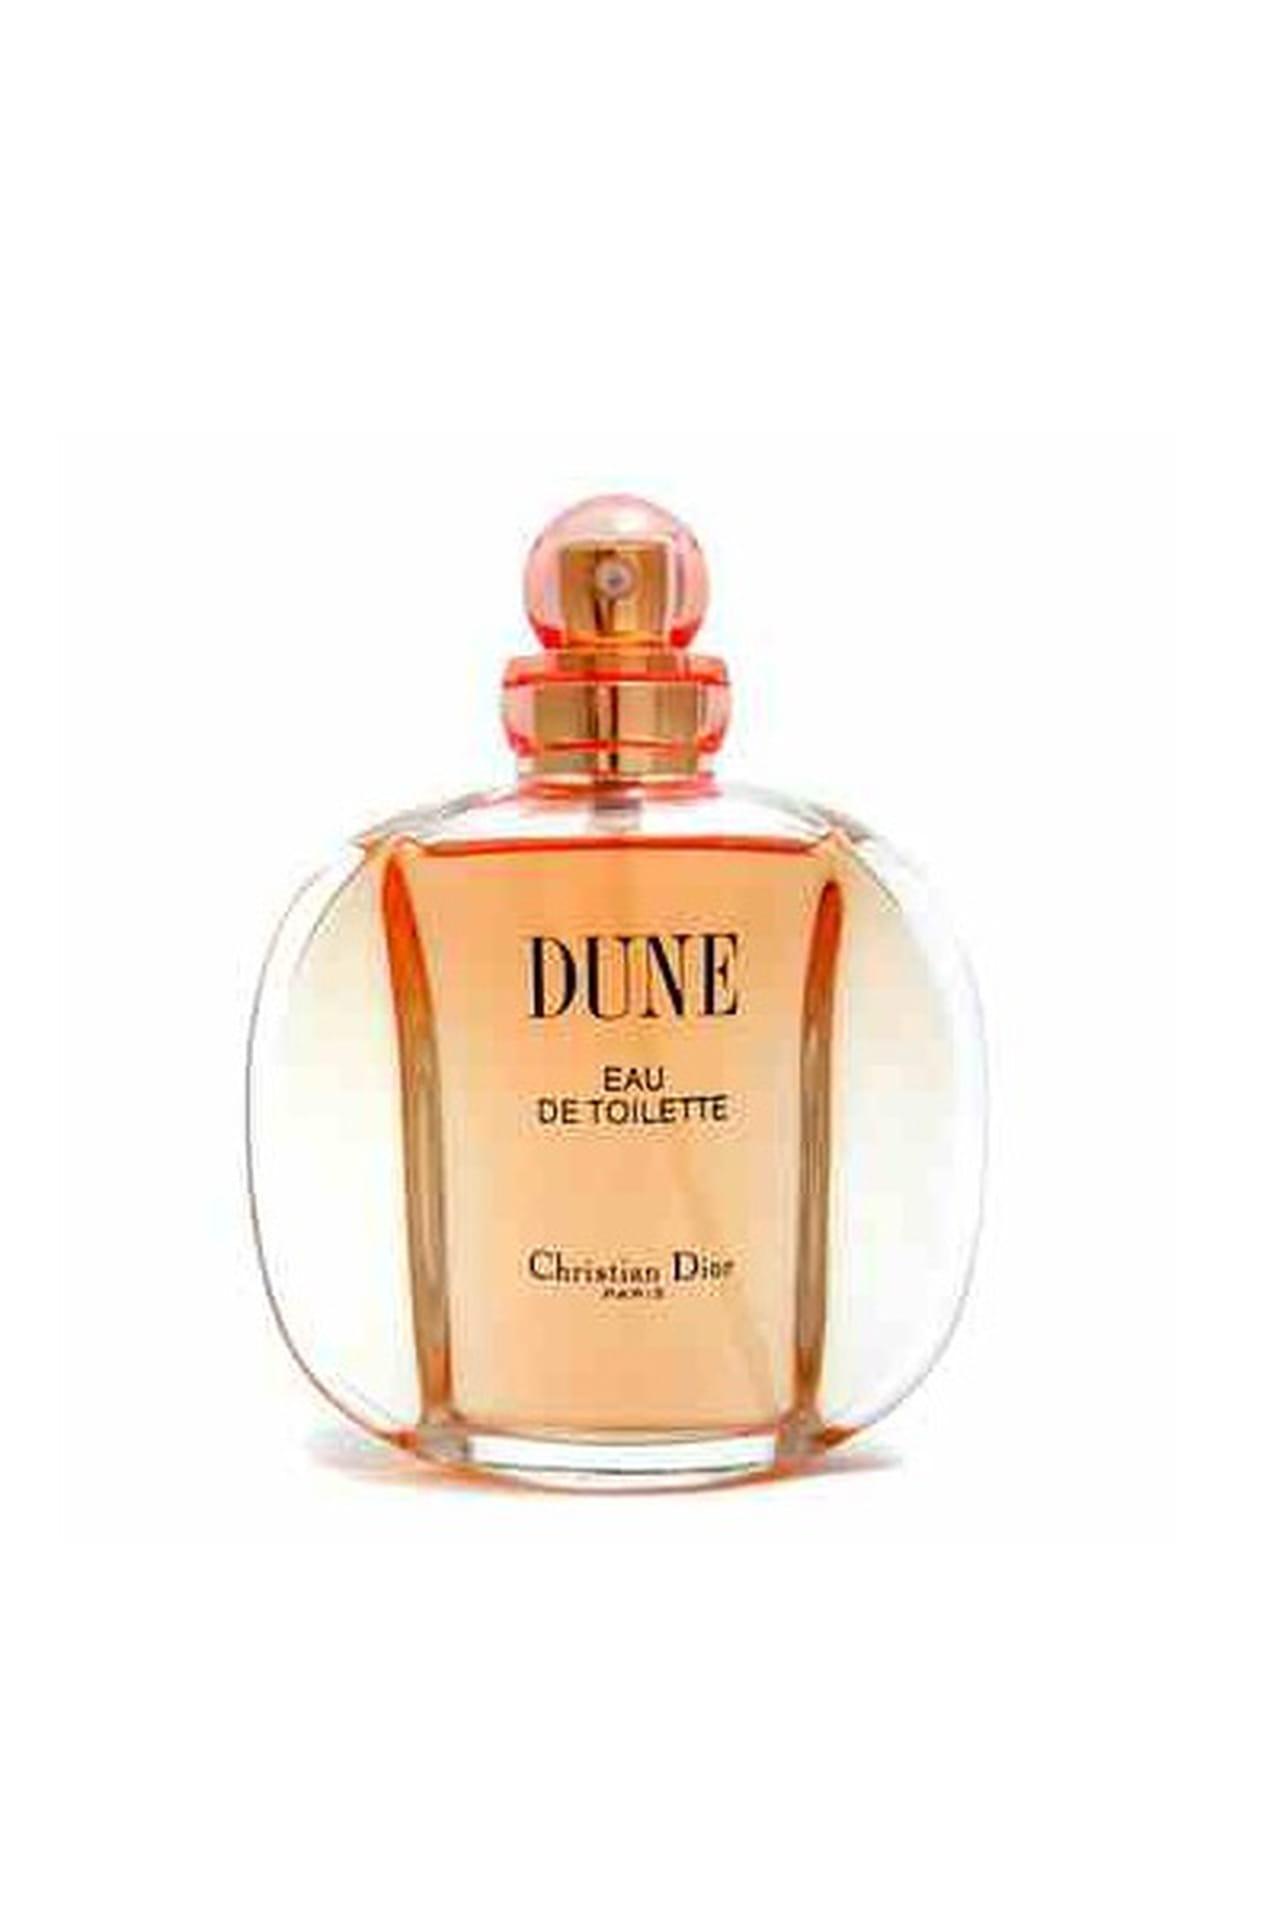 74188290687c8 أفضل عطور ديور Dior النسائية...كوني ساحرة